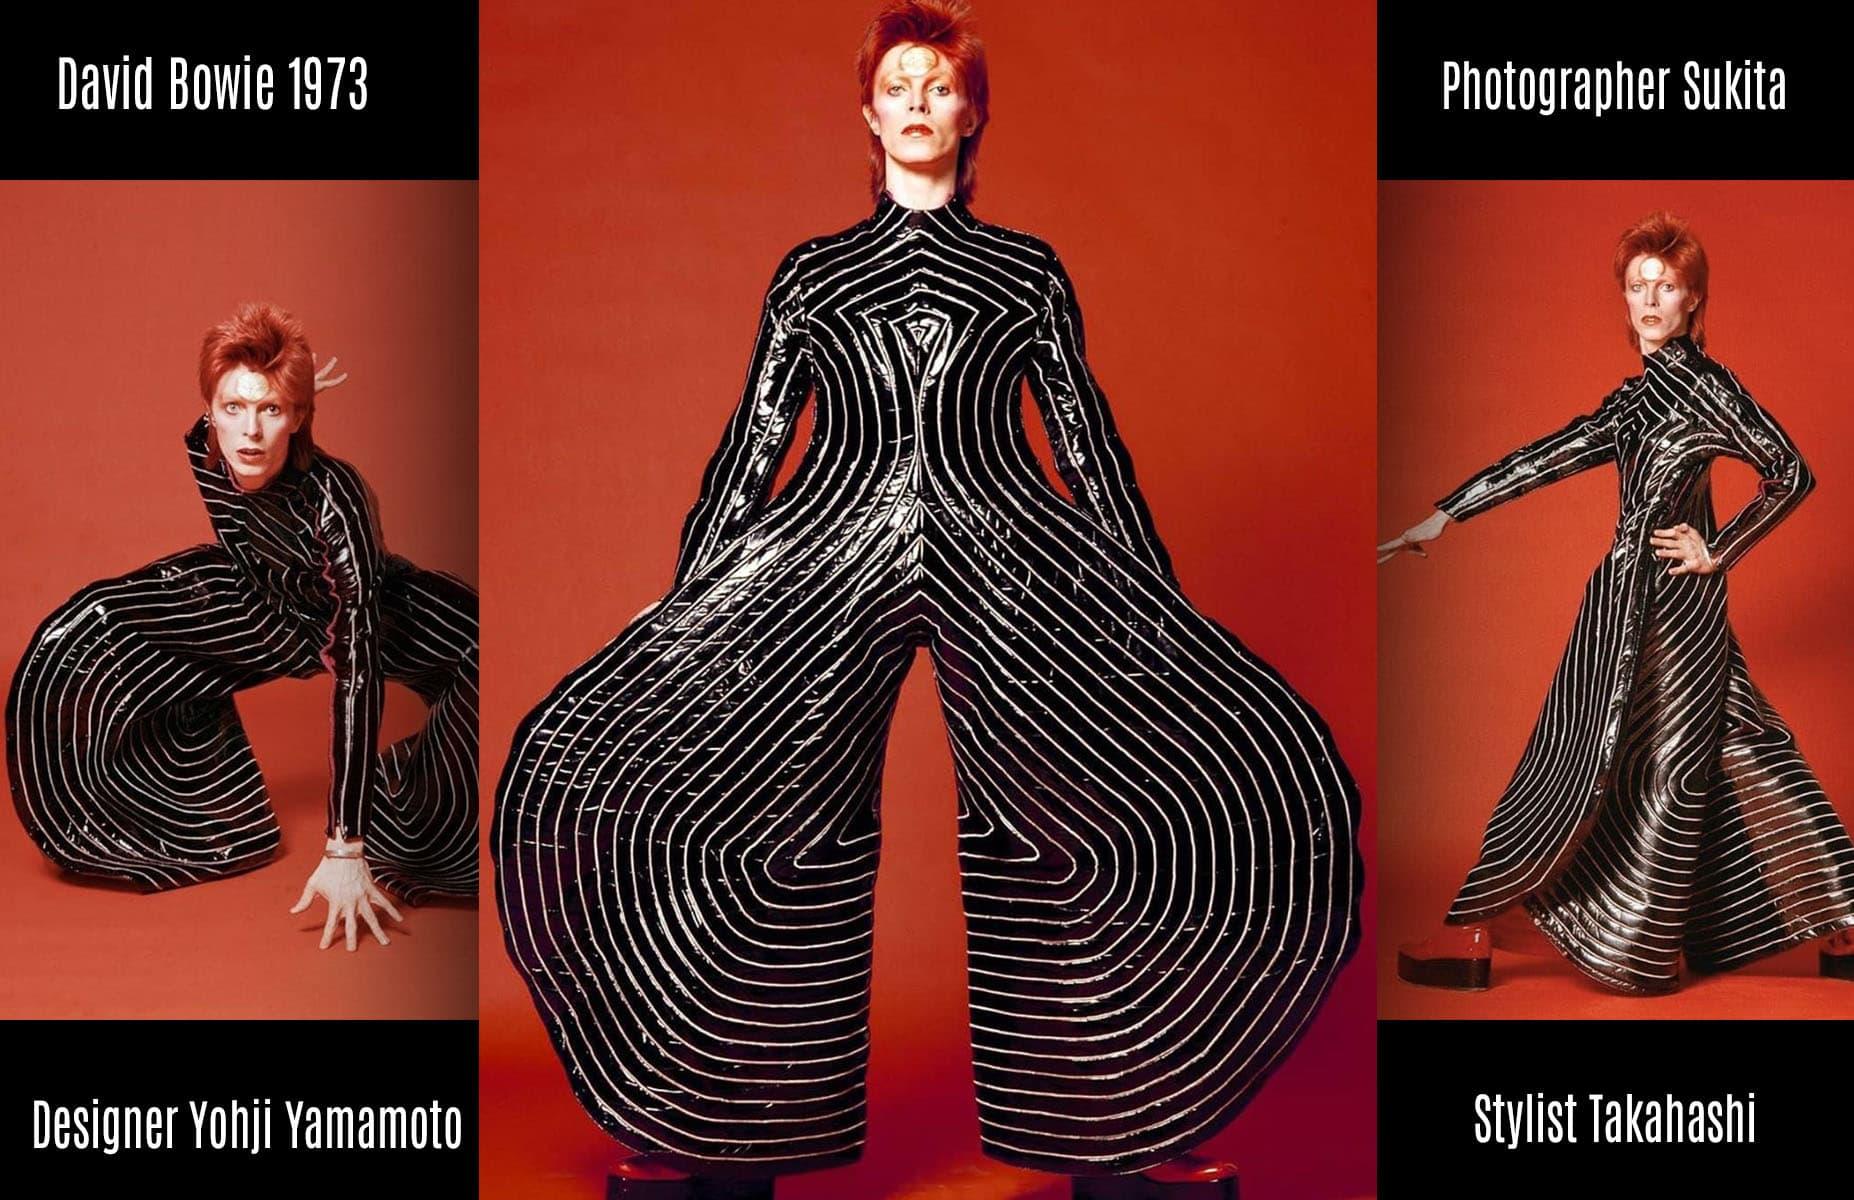 David Bowie 1973 – designer Yohji Yamamoto, stylist Takahashi, photographer Sukita